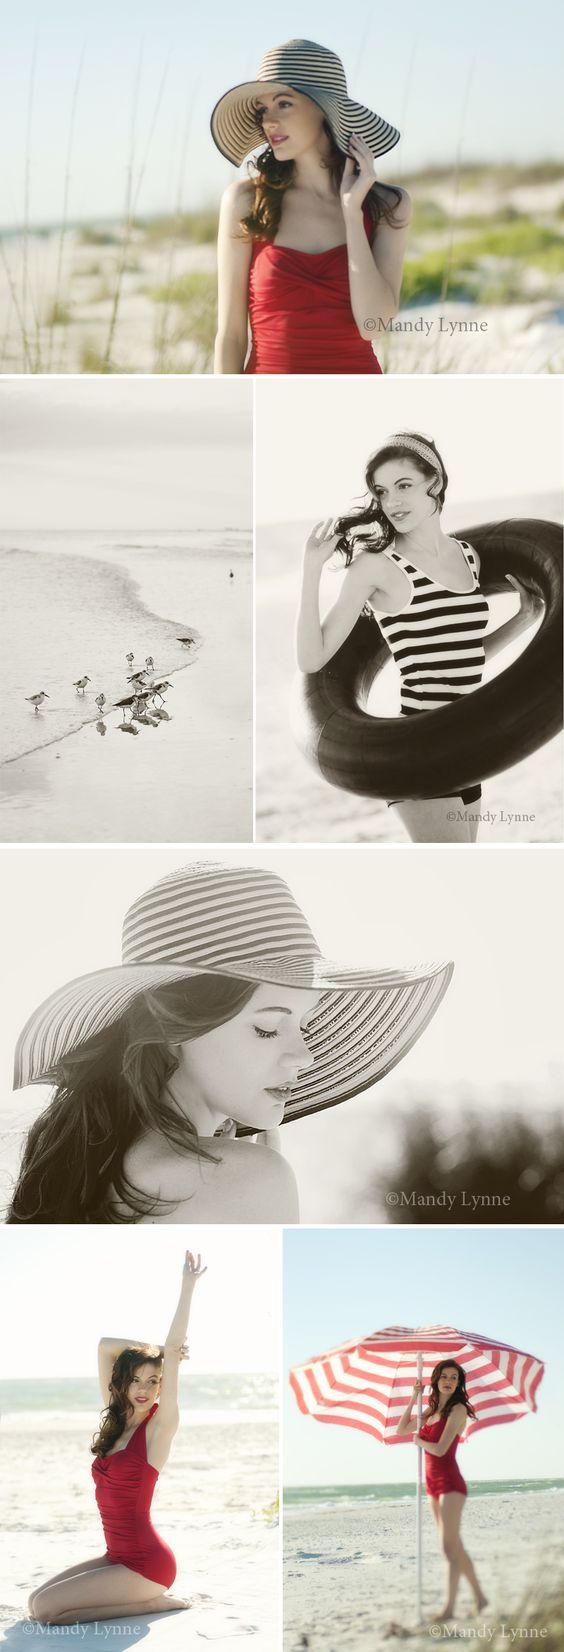 Love the sun hat and the big striped beach umbrella: Photography Senior, Beach Session, Senior Photo, Picture Idea, Vintage Senior Picture, Vintage Picture, Beach Shoot, Vintage Photoshoot, Beach Photoshoot Ideas